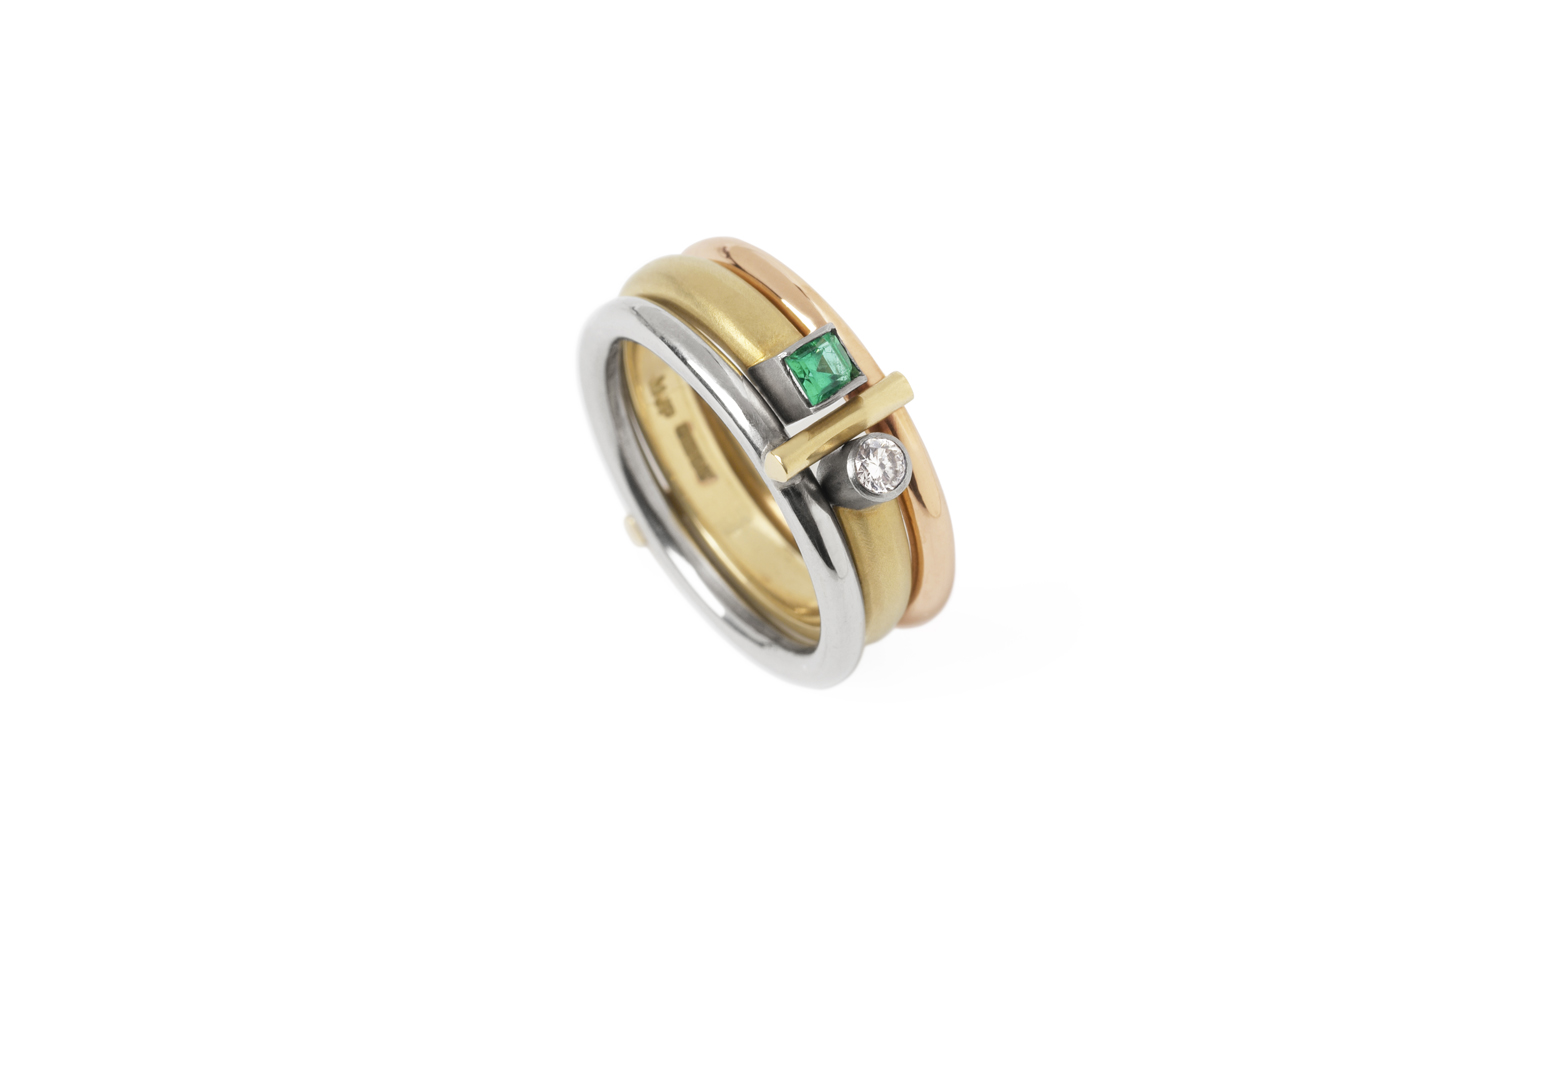 Preva Interlock Emerald Ring Set